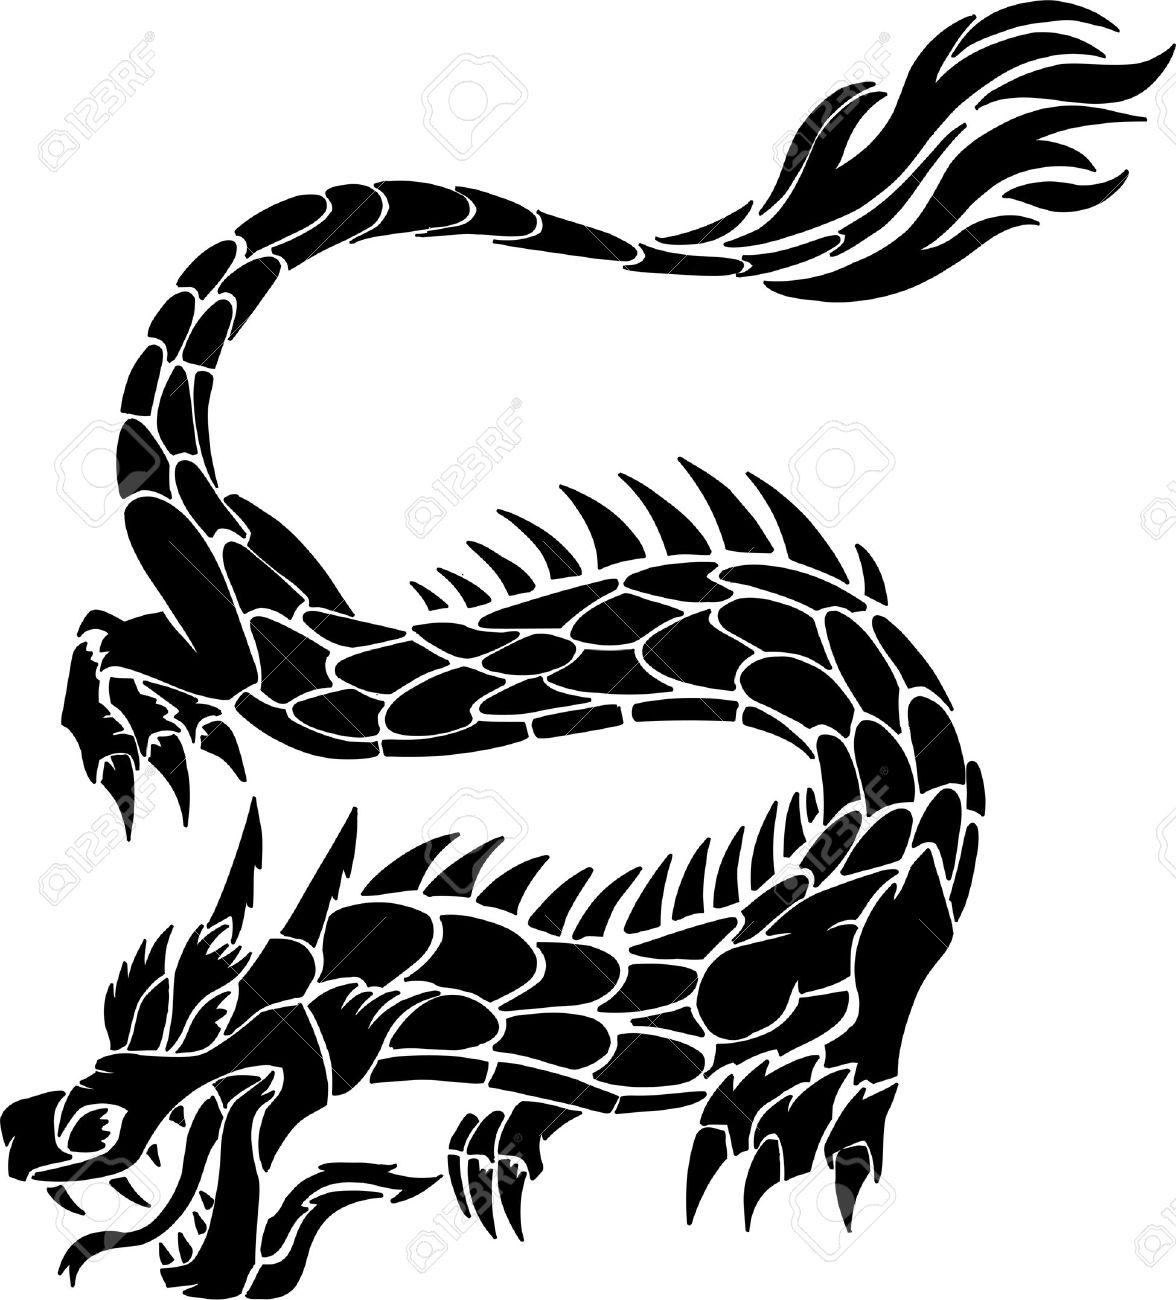 Tribal Tattoo Dragon Vector Illustration Stock Vector - 3631724